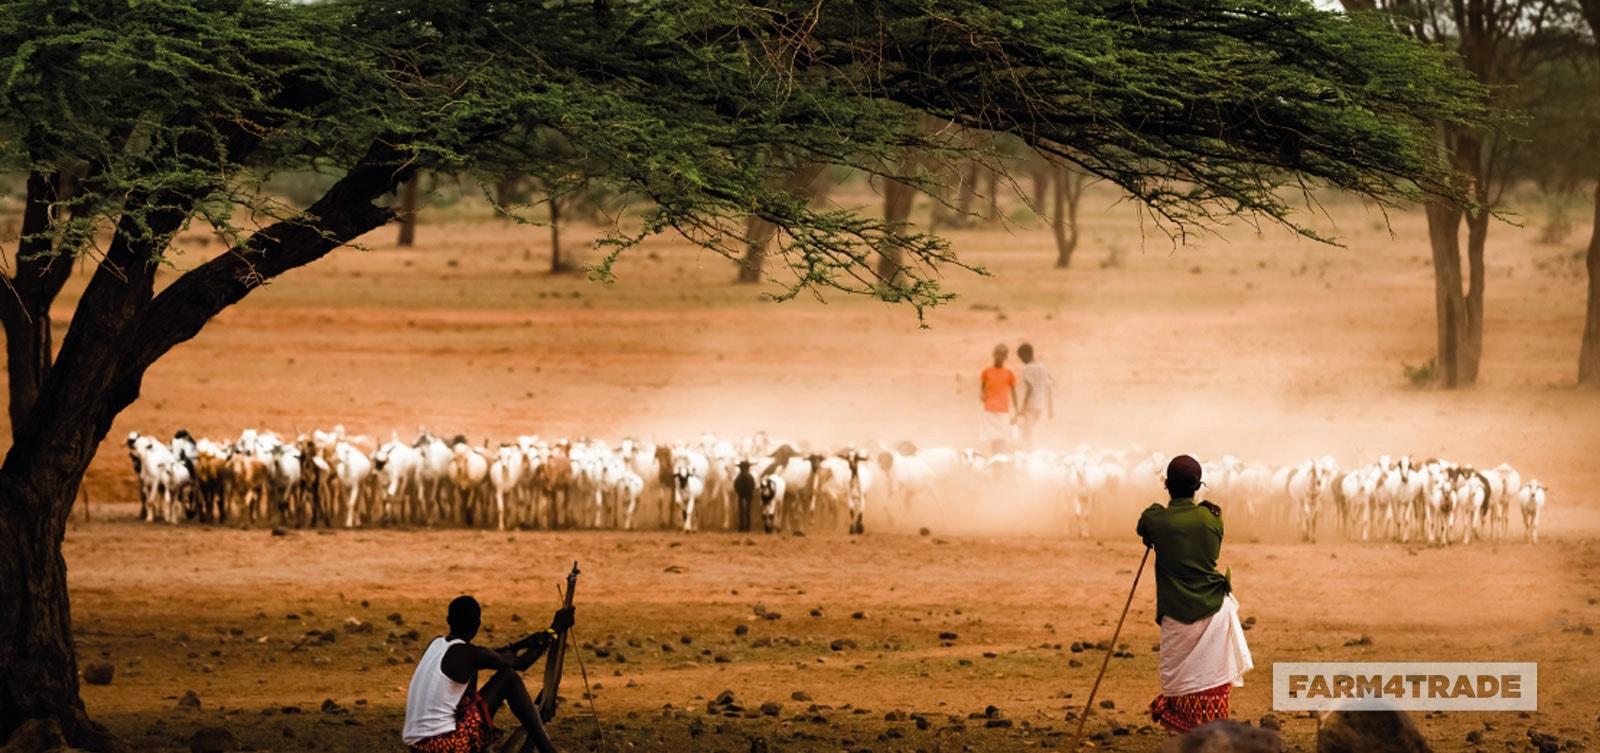 Farm4Trade-Goat-Breeding-the-four-main-types